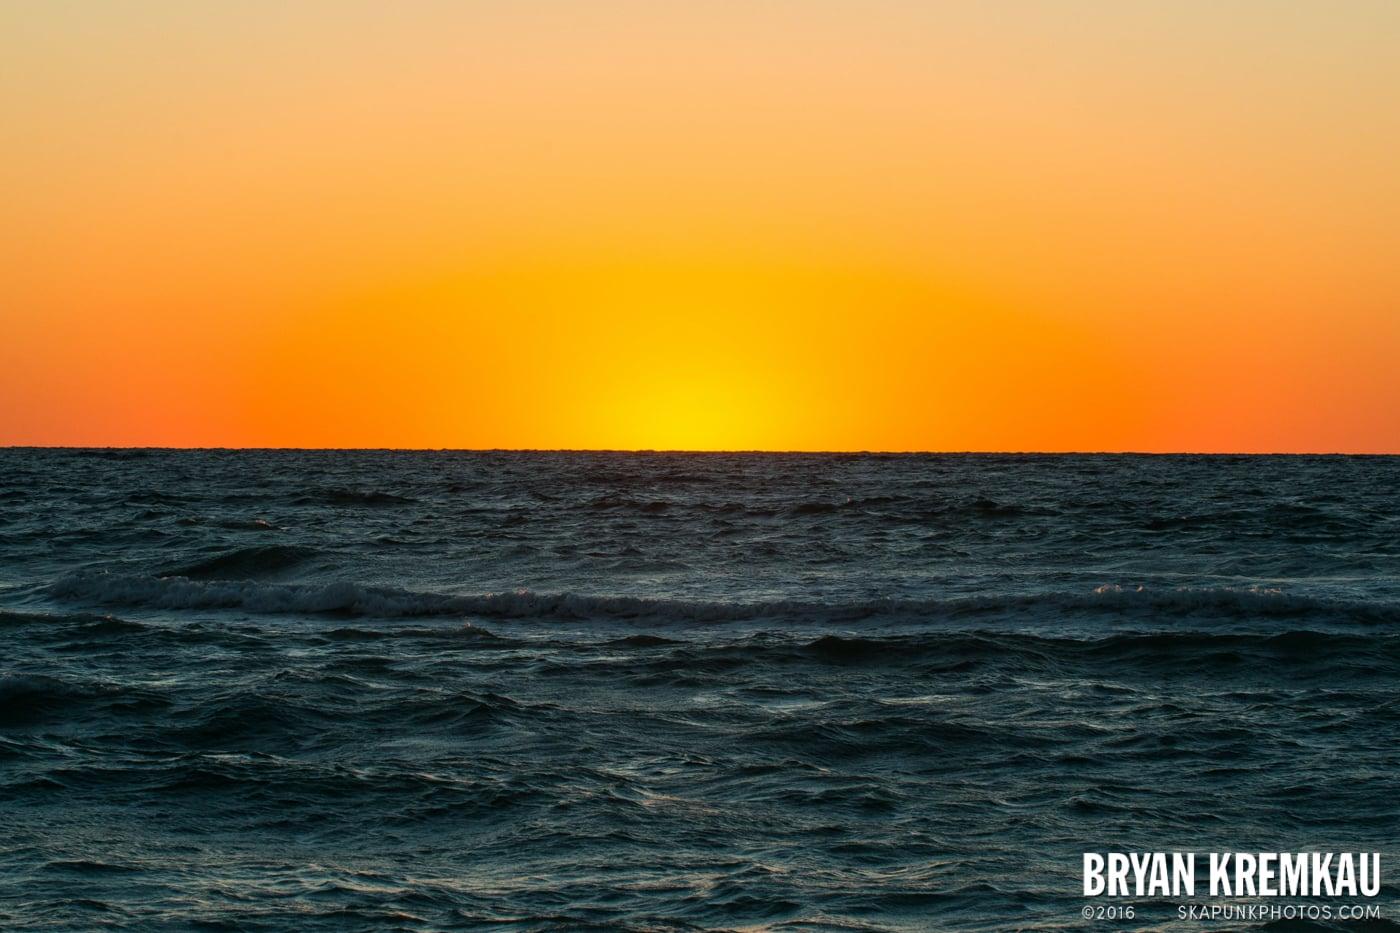 Sunsets, Astrophotography & Birds @ Venice, Florida - 10.25.14 - 11.5.14 (95)